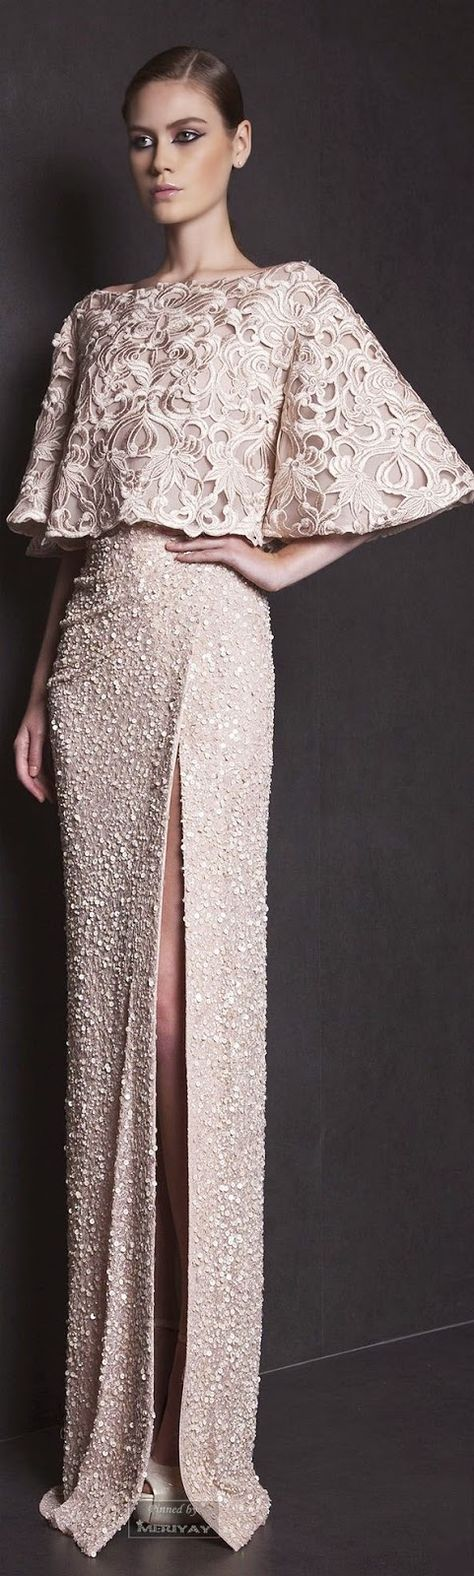 Glamour gowns / karen cox.  Tony Ward 2015